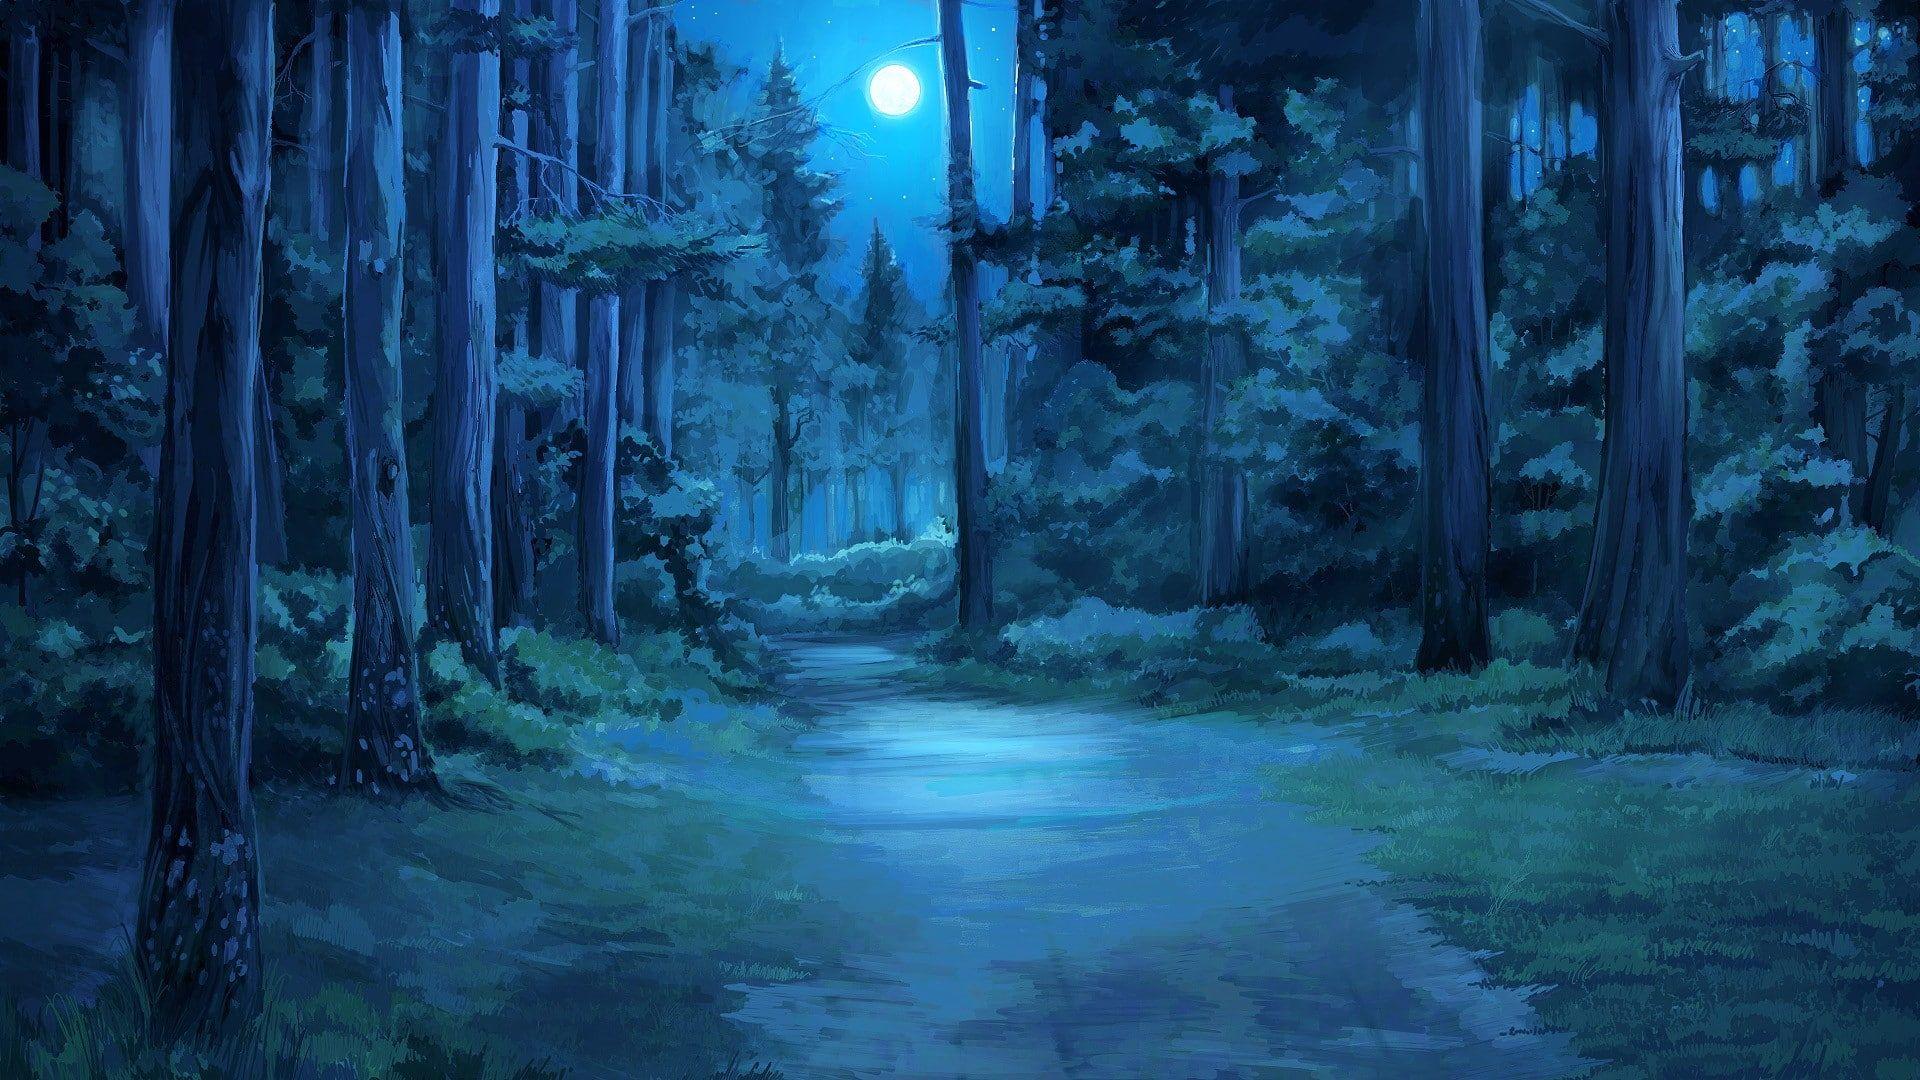 Moon Everlasting Summer Moonlight Forest Clearing 1080p Wallpaper Hdwallpaper Desktop Paysage Manga Paysage Imaginaire Art Esthetique